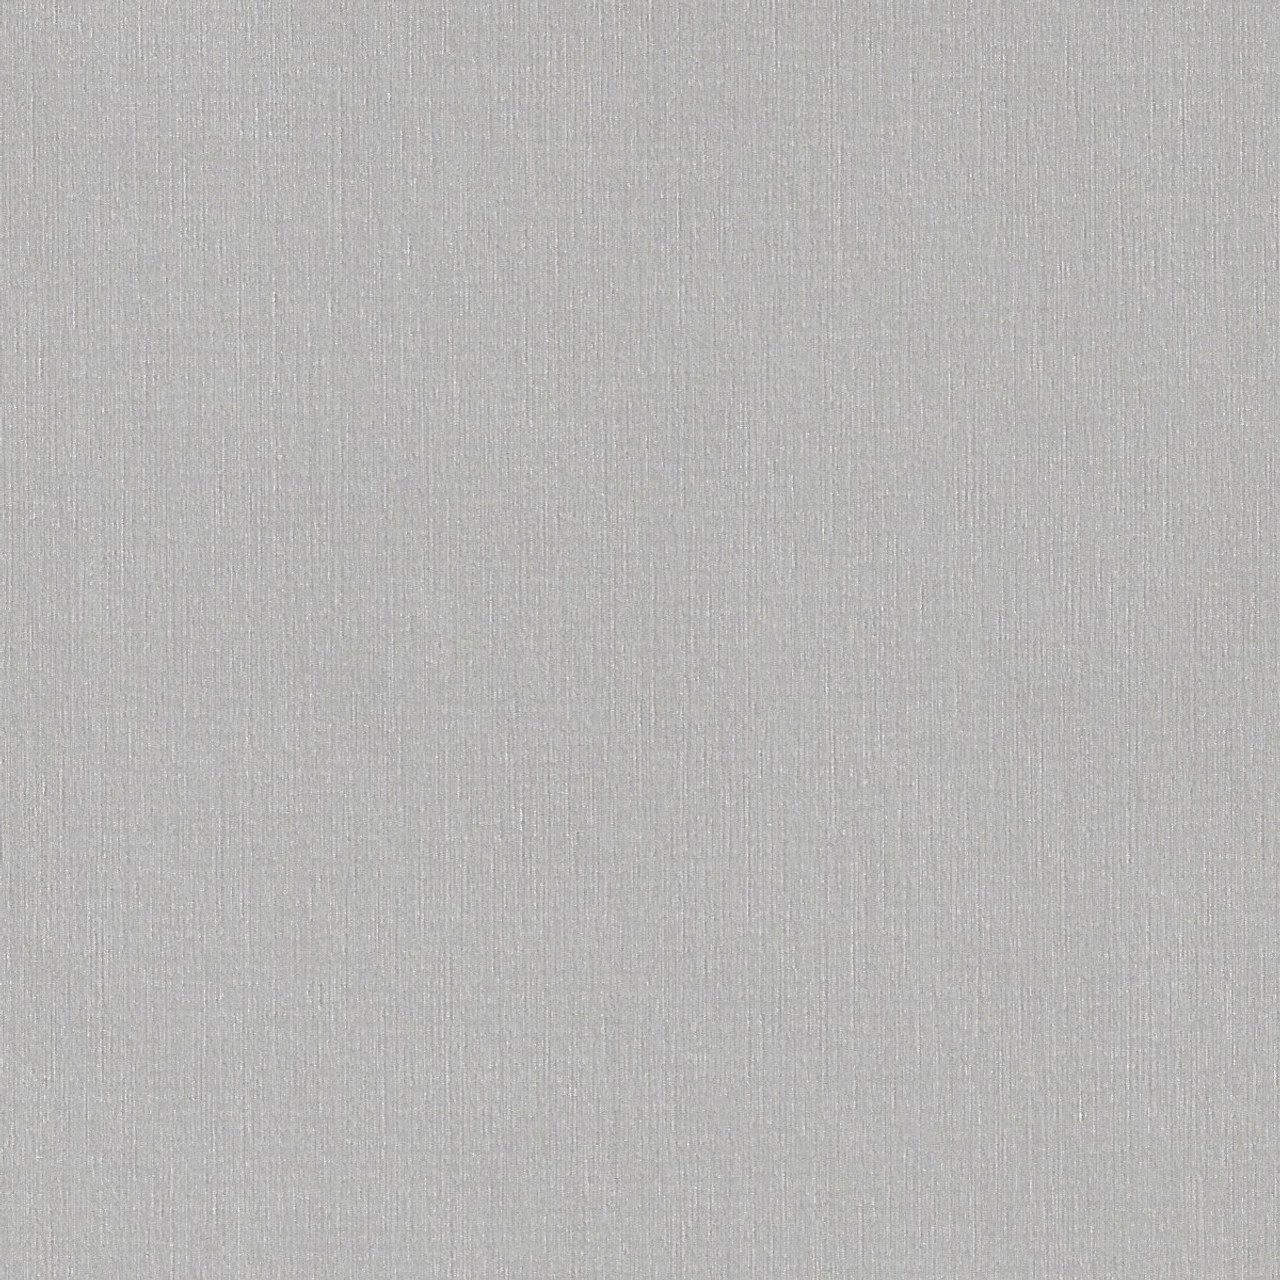 Reflex REF-7801 Silver